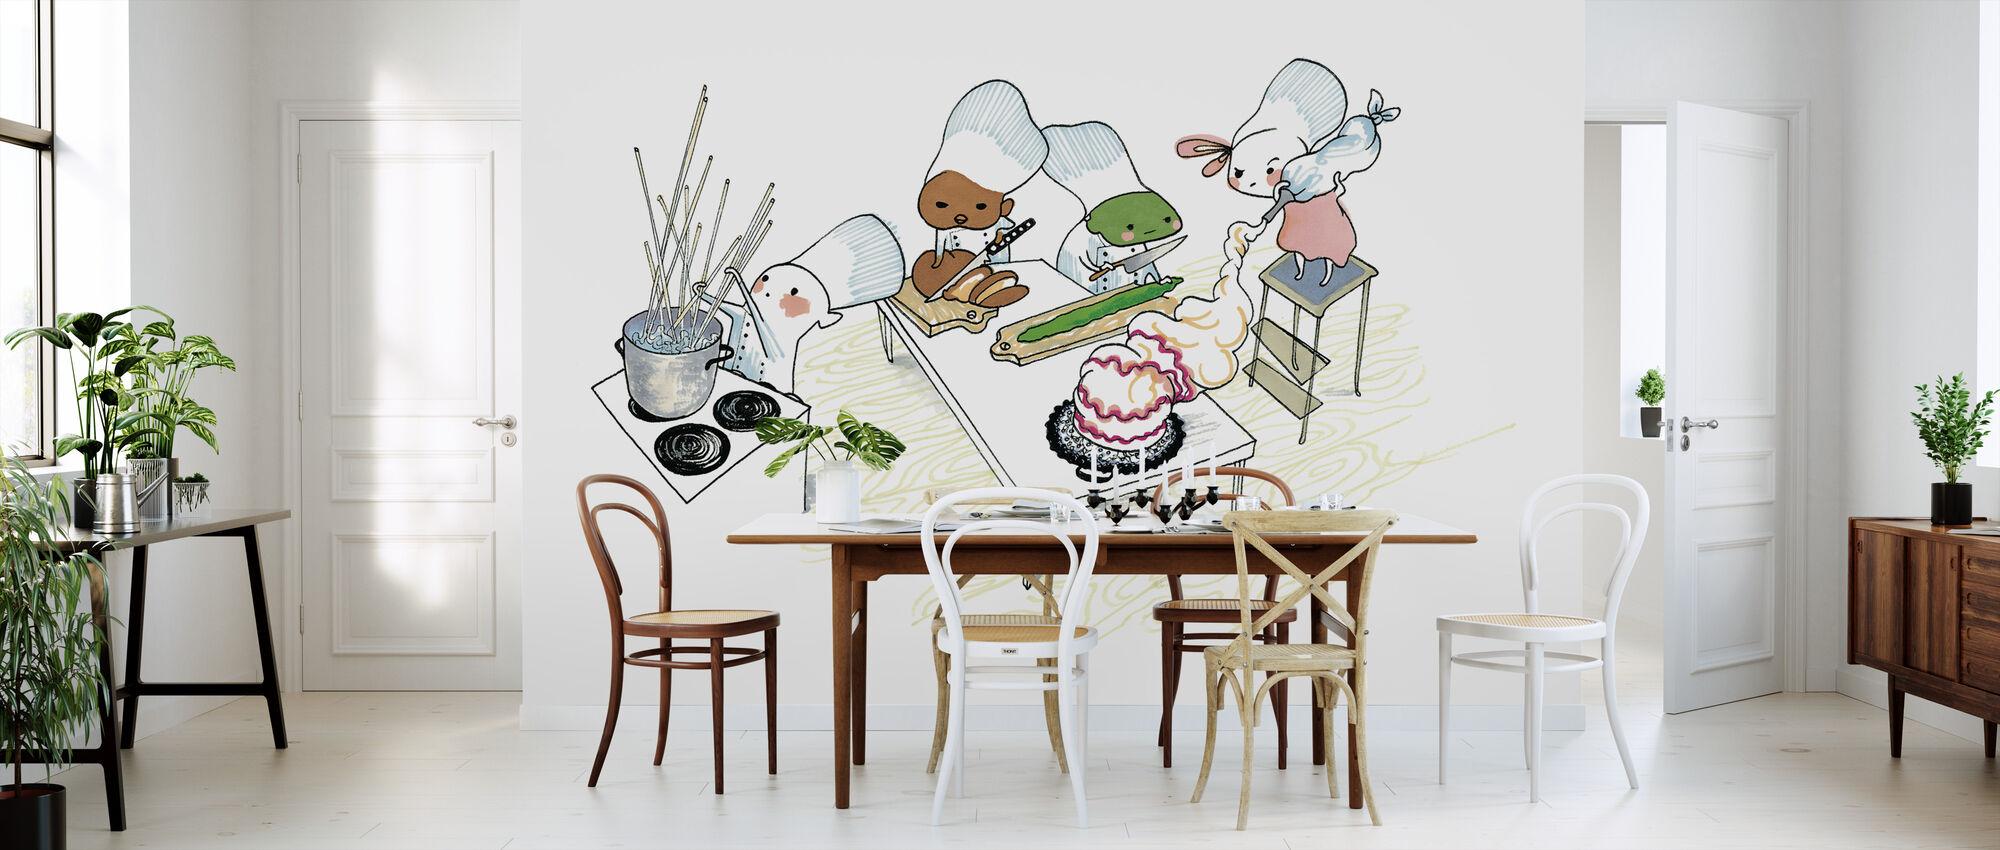 Kitchen - Wallpaper - Kitchen